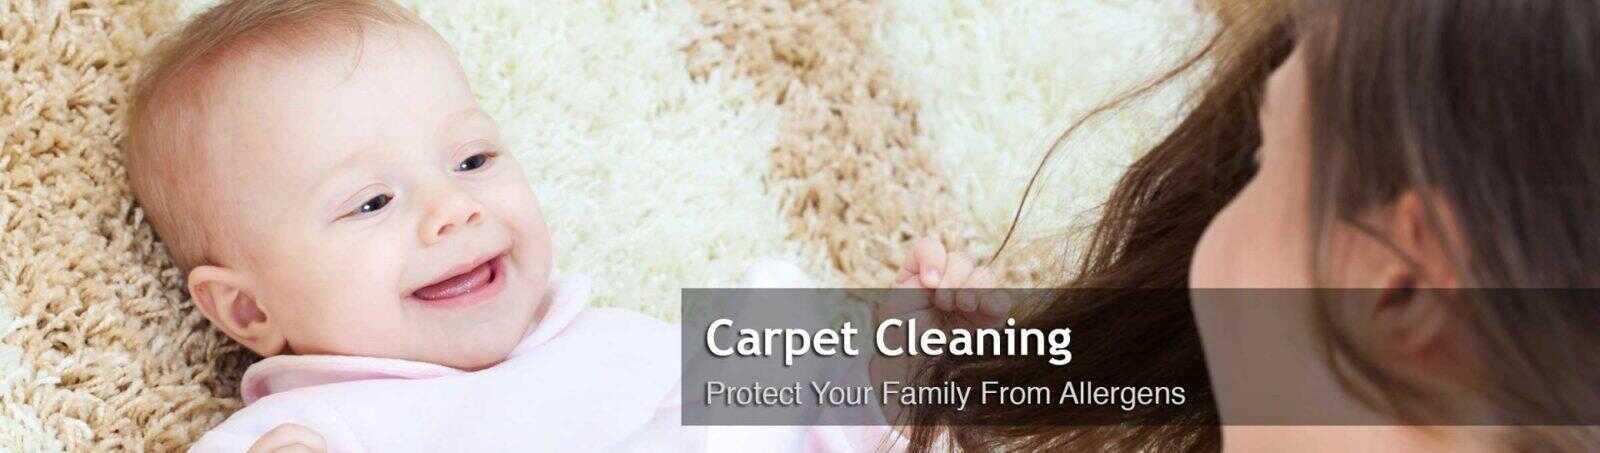 tim carpet cleaning banner